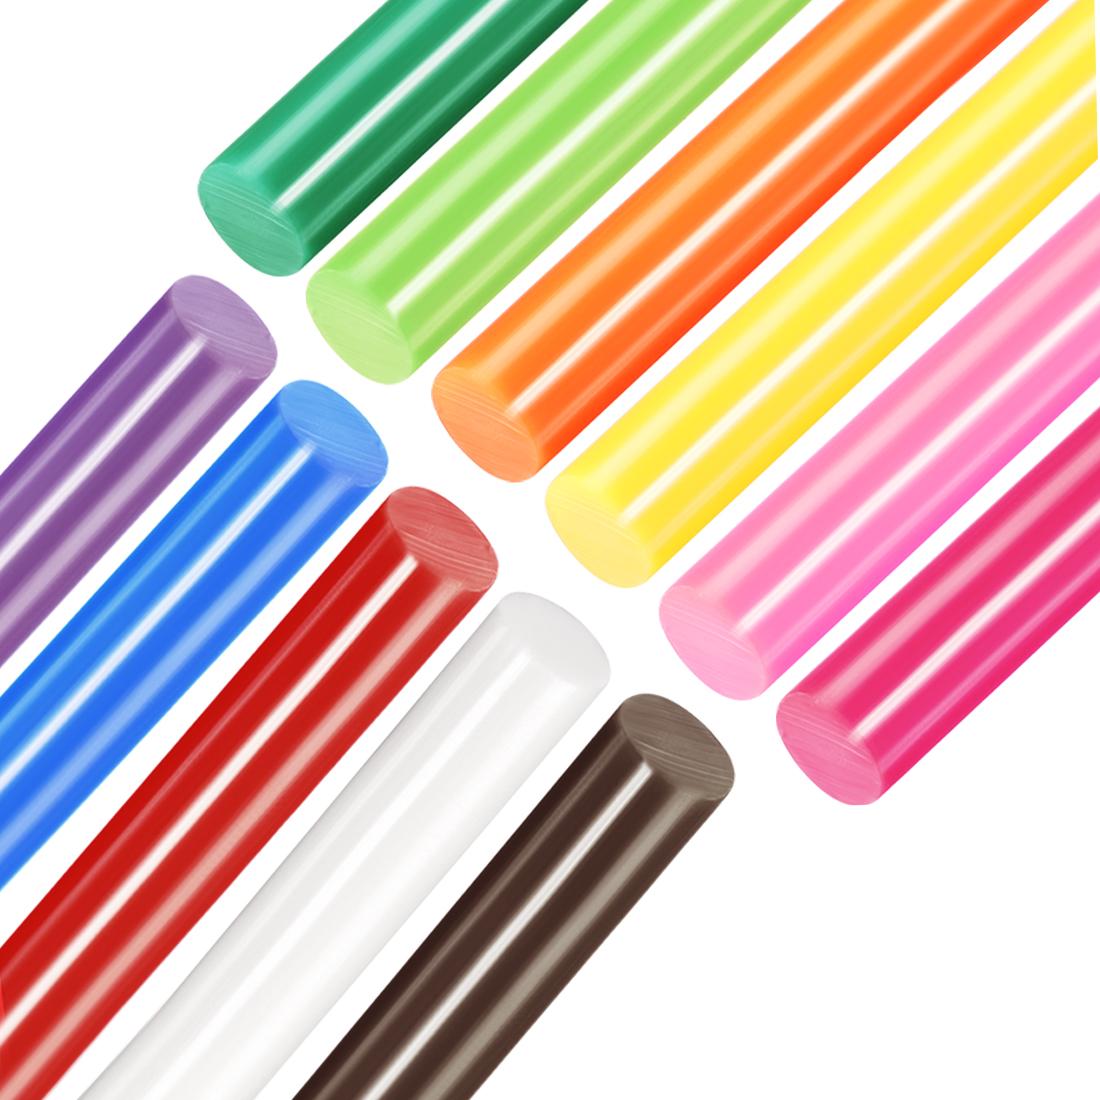 Colorful Hot Melt Glue Gun Sticks, 250mm x 11mm,Use with Most Glue Guns,11pcs